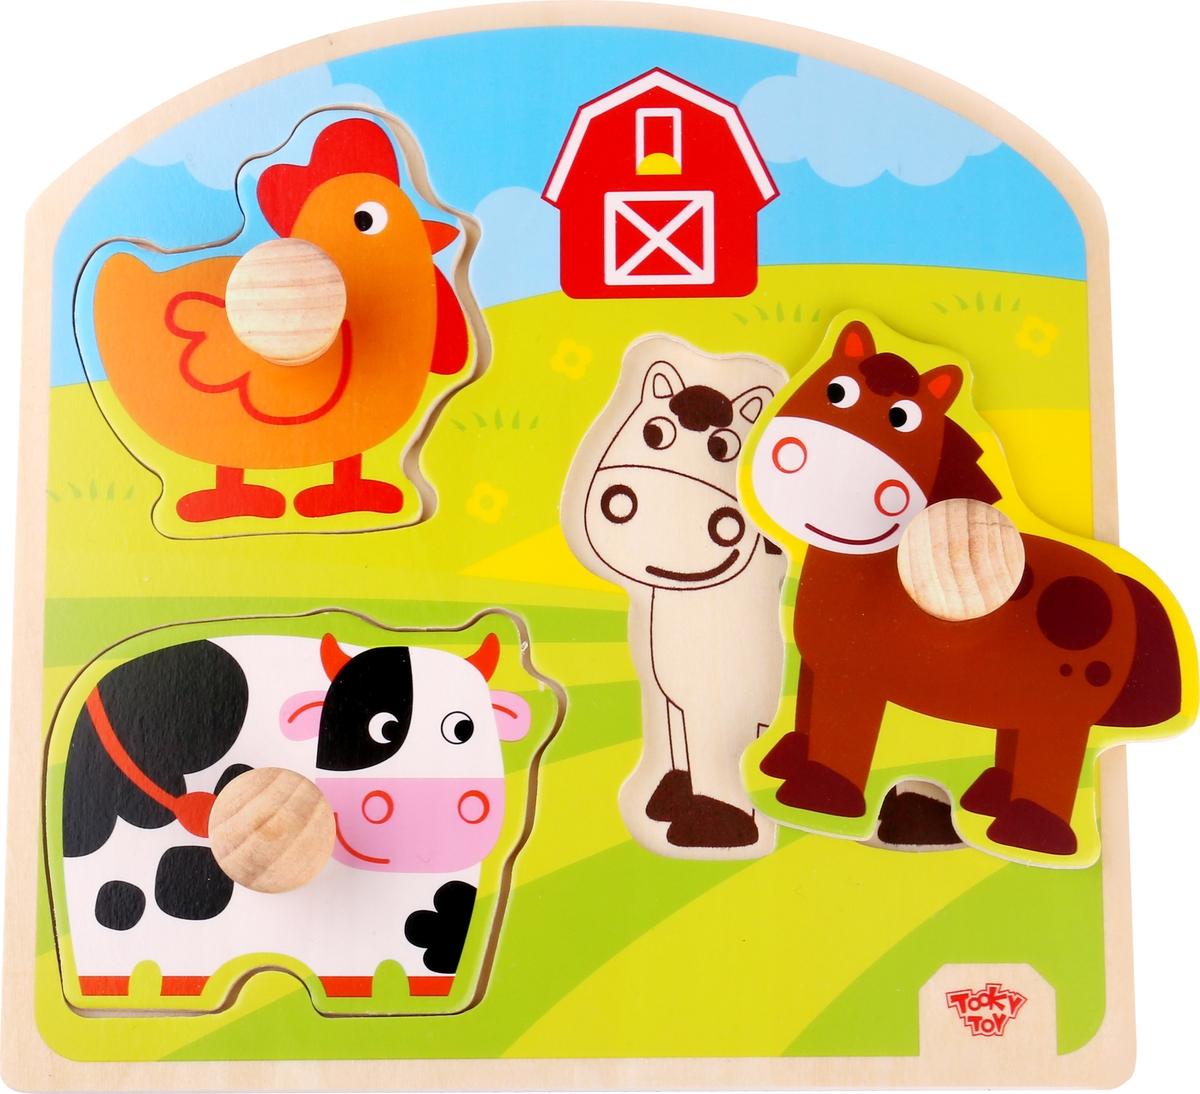 Tooky Toy Пазл Ферма TKG021 пазлы qiqu wooden toy factory рамка вкладыш машинки